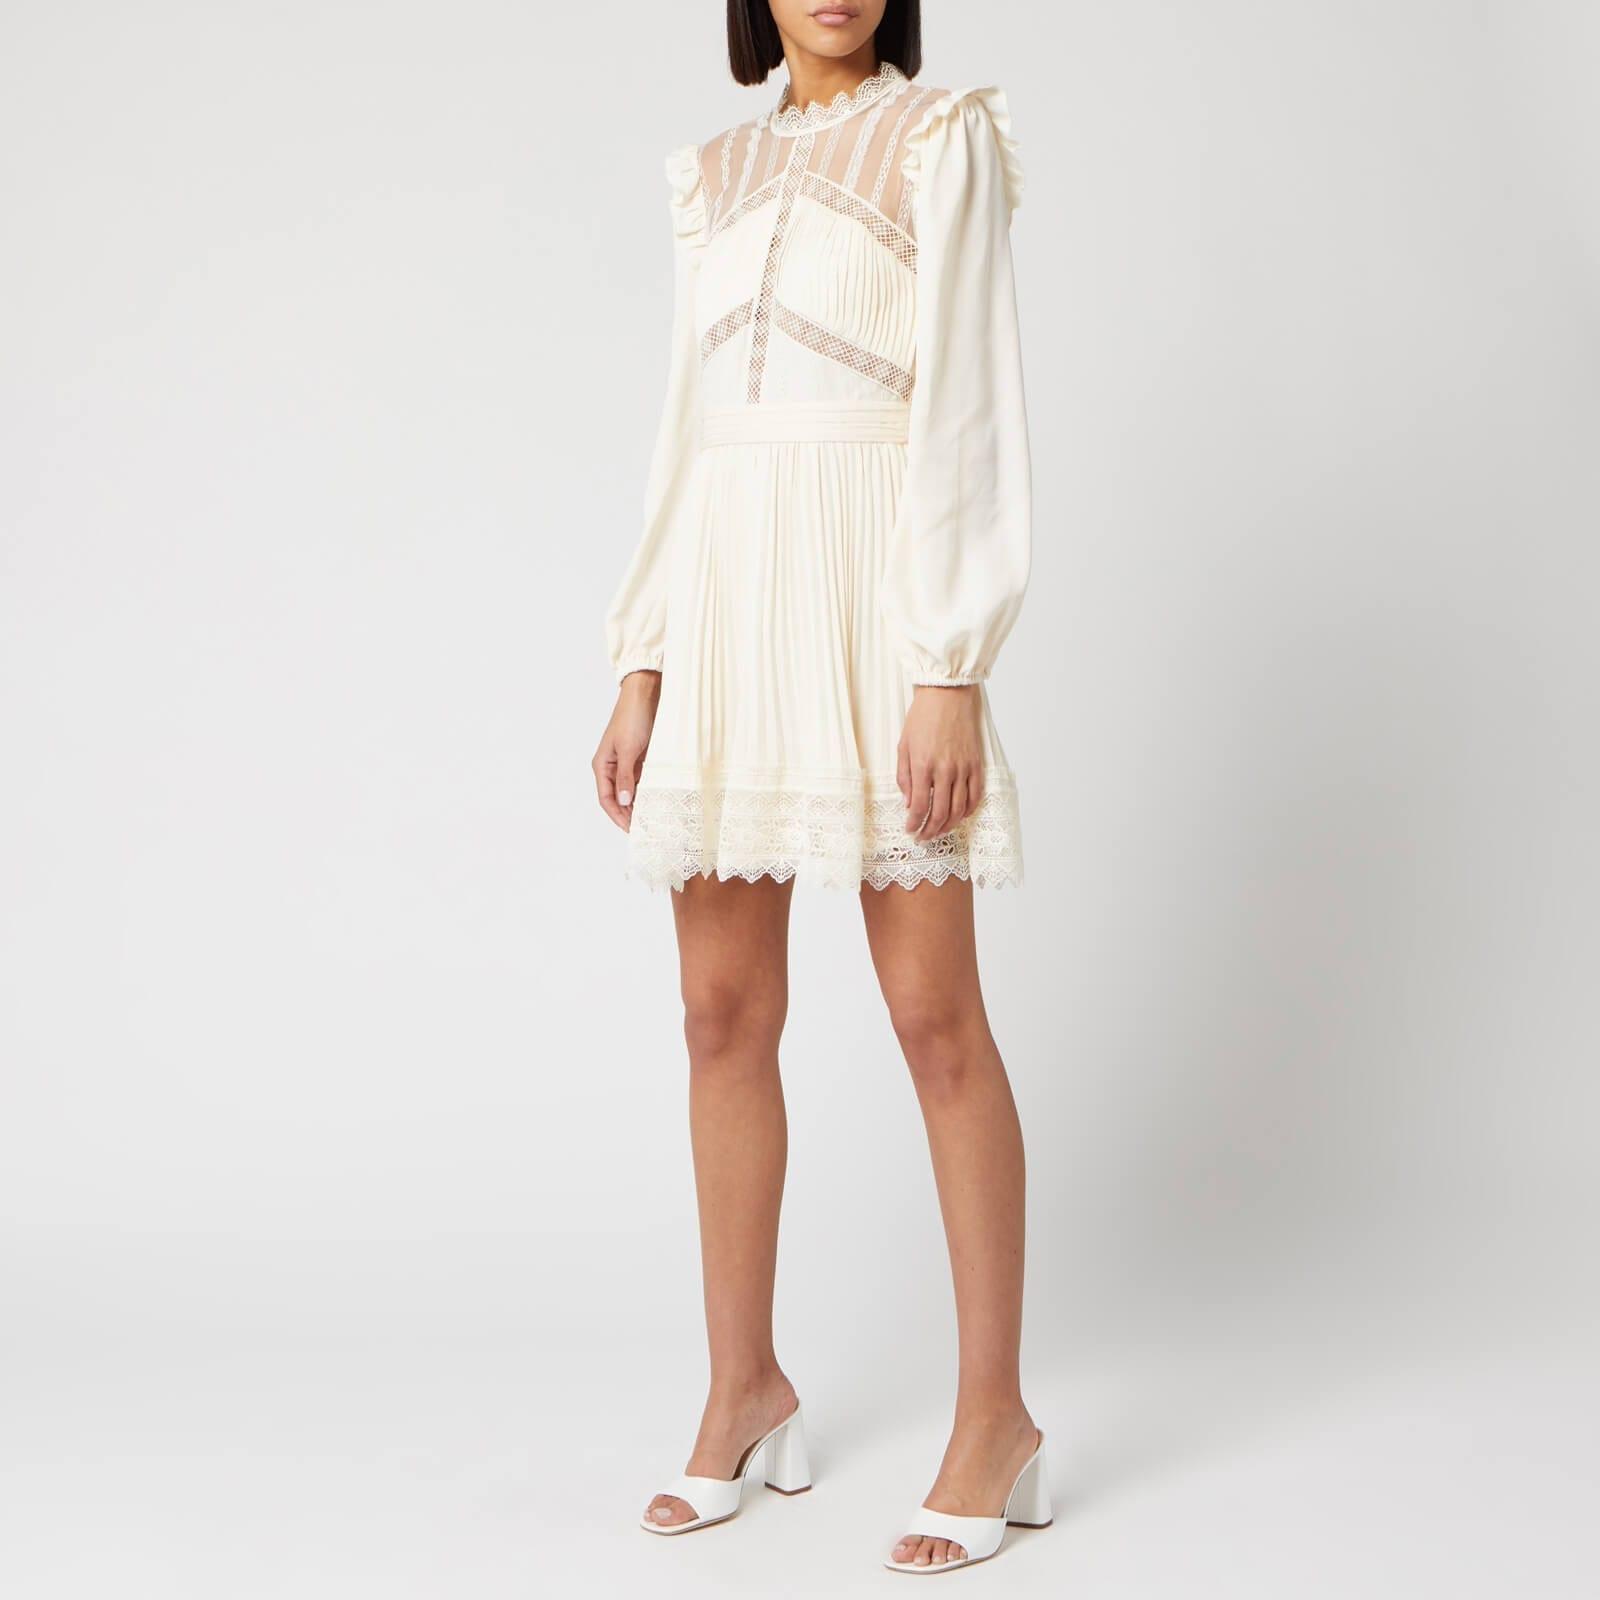 SELF-PORTRAIT Women's Cream Lace Trim Mini Dress